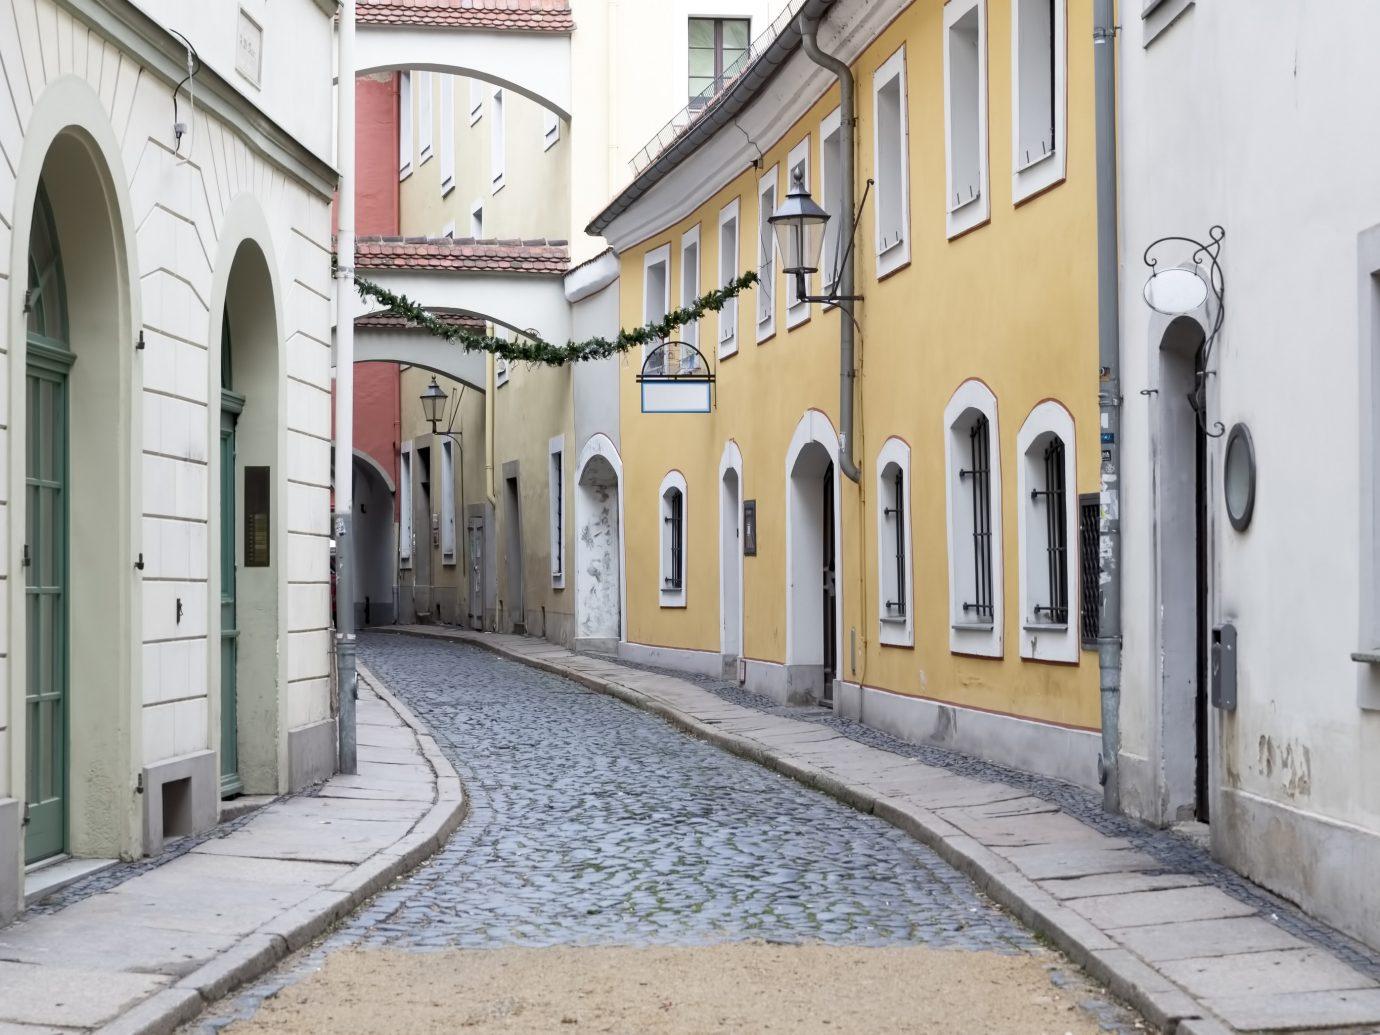 Berlin europe Germany Trip Ideas Town infrastructure neighbourhood street road alley window facade house City building door